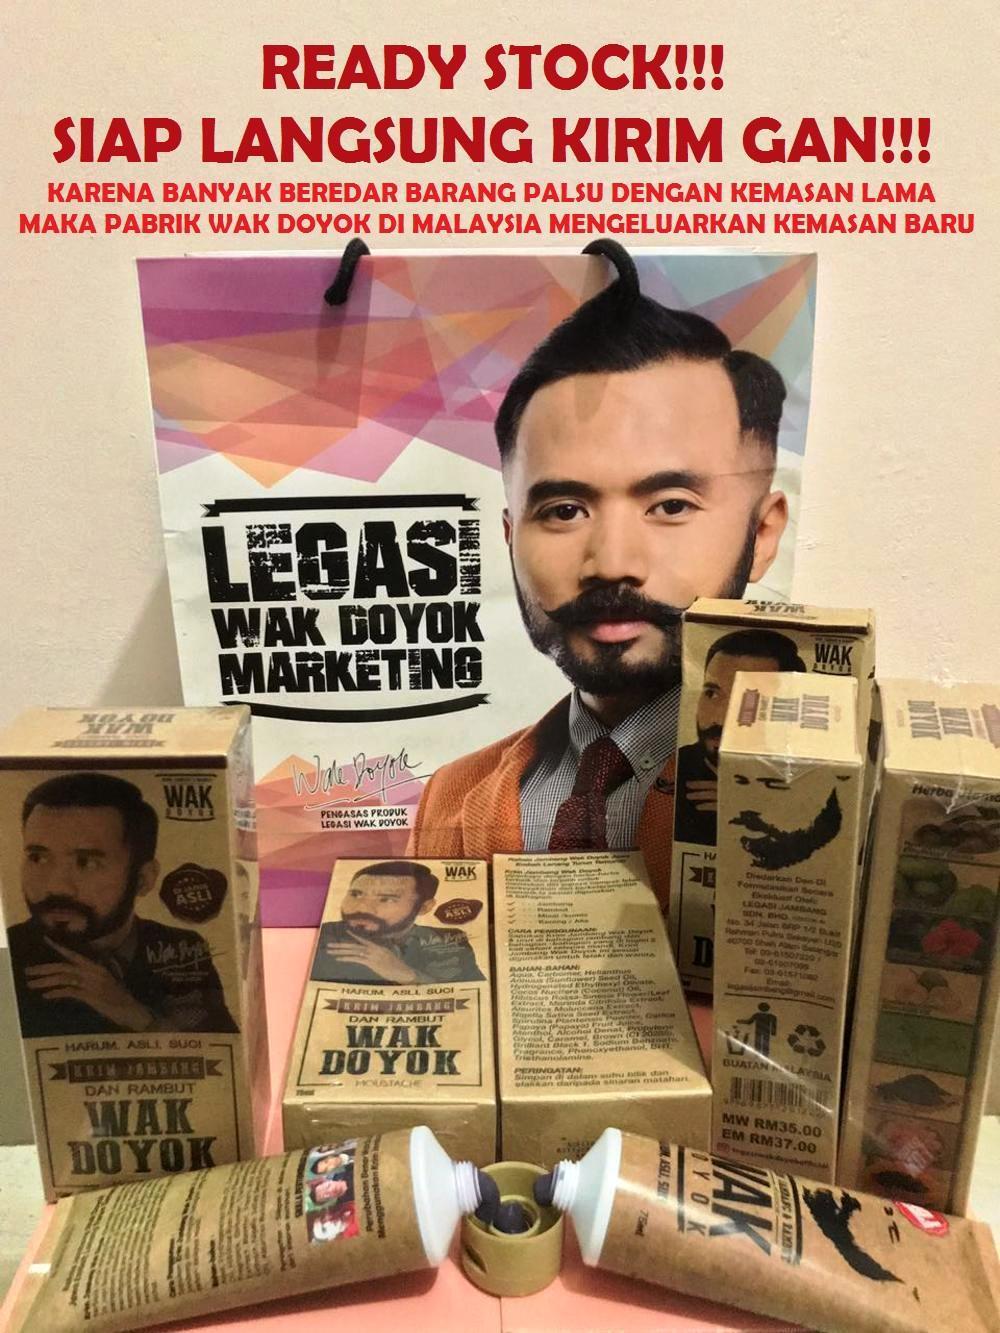 Wak Doyok Krim Jambang 75ml Malaysia Original Cream Wakdoyok ORIGINAL di lapak JeLo Shop jeloshop